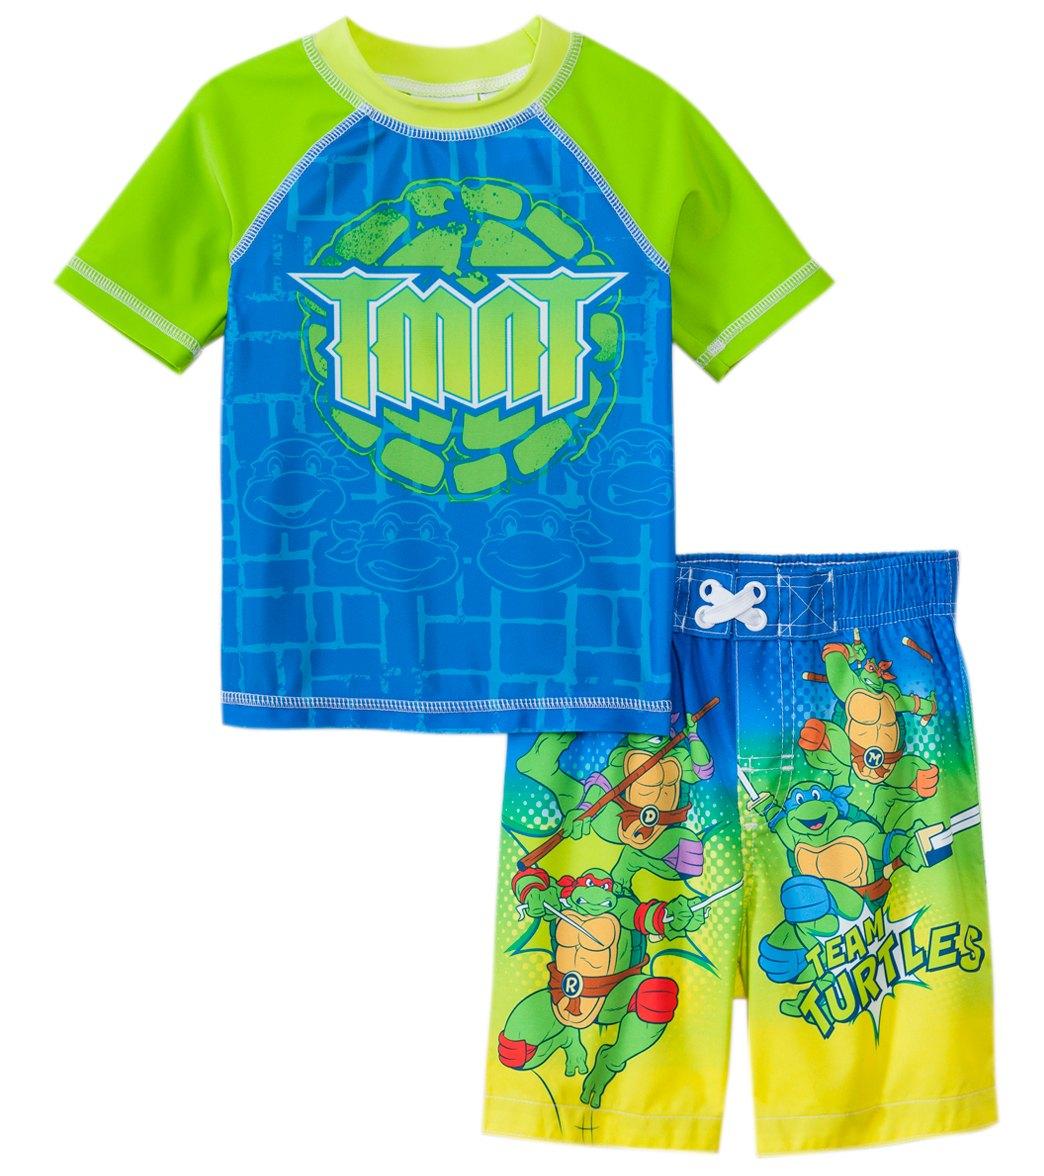 fc6d53e75f Nickelodeon Boys' Teenage Mutant Ninja Turtles Swim Trunks & Rashguard Set  (2T-4T) at SwimOutlet.com